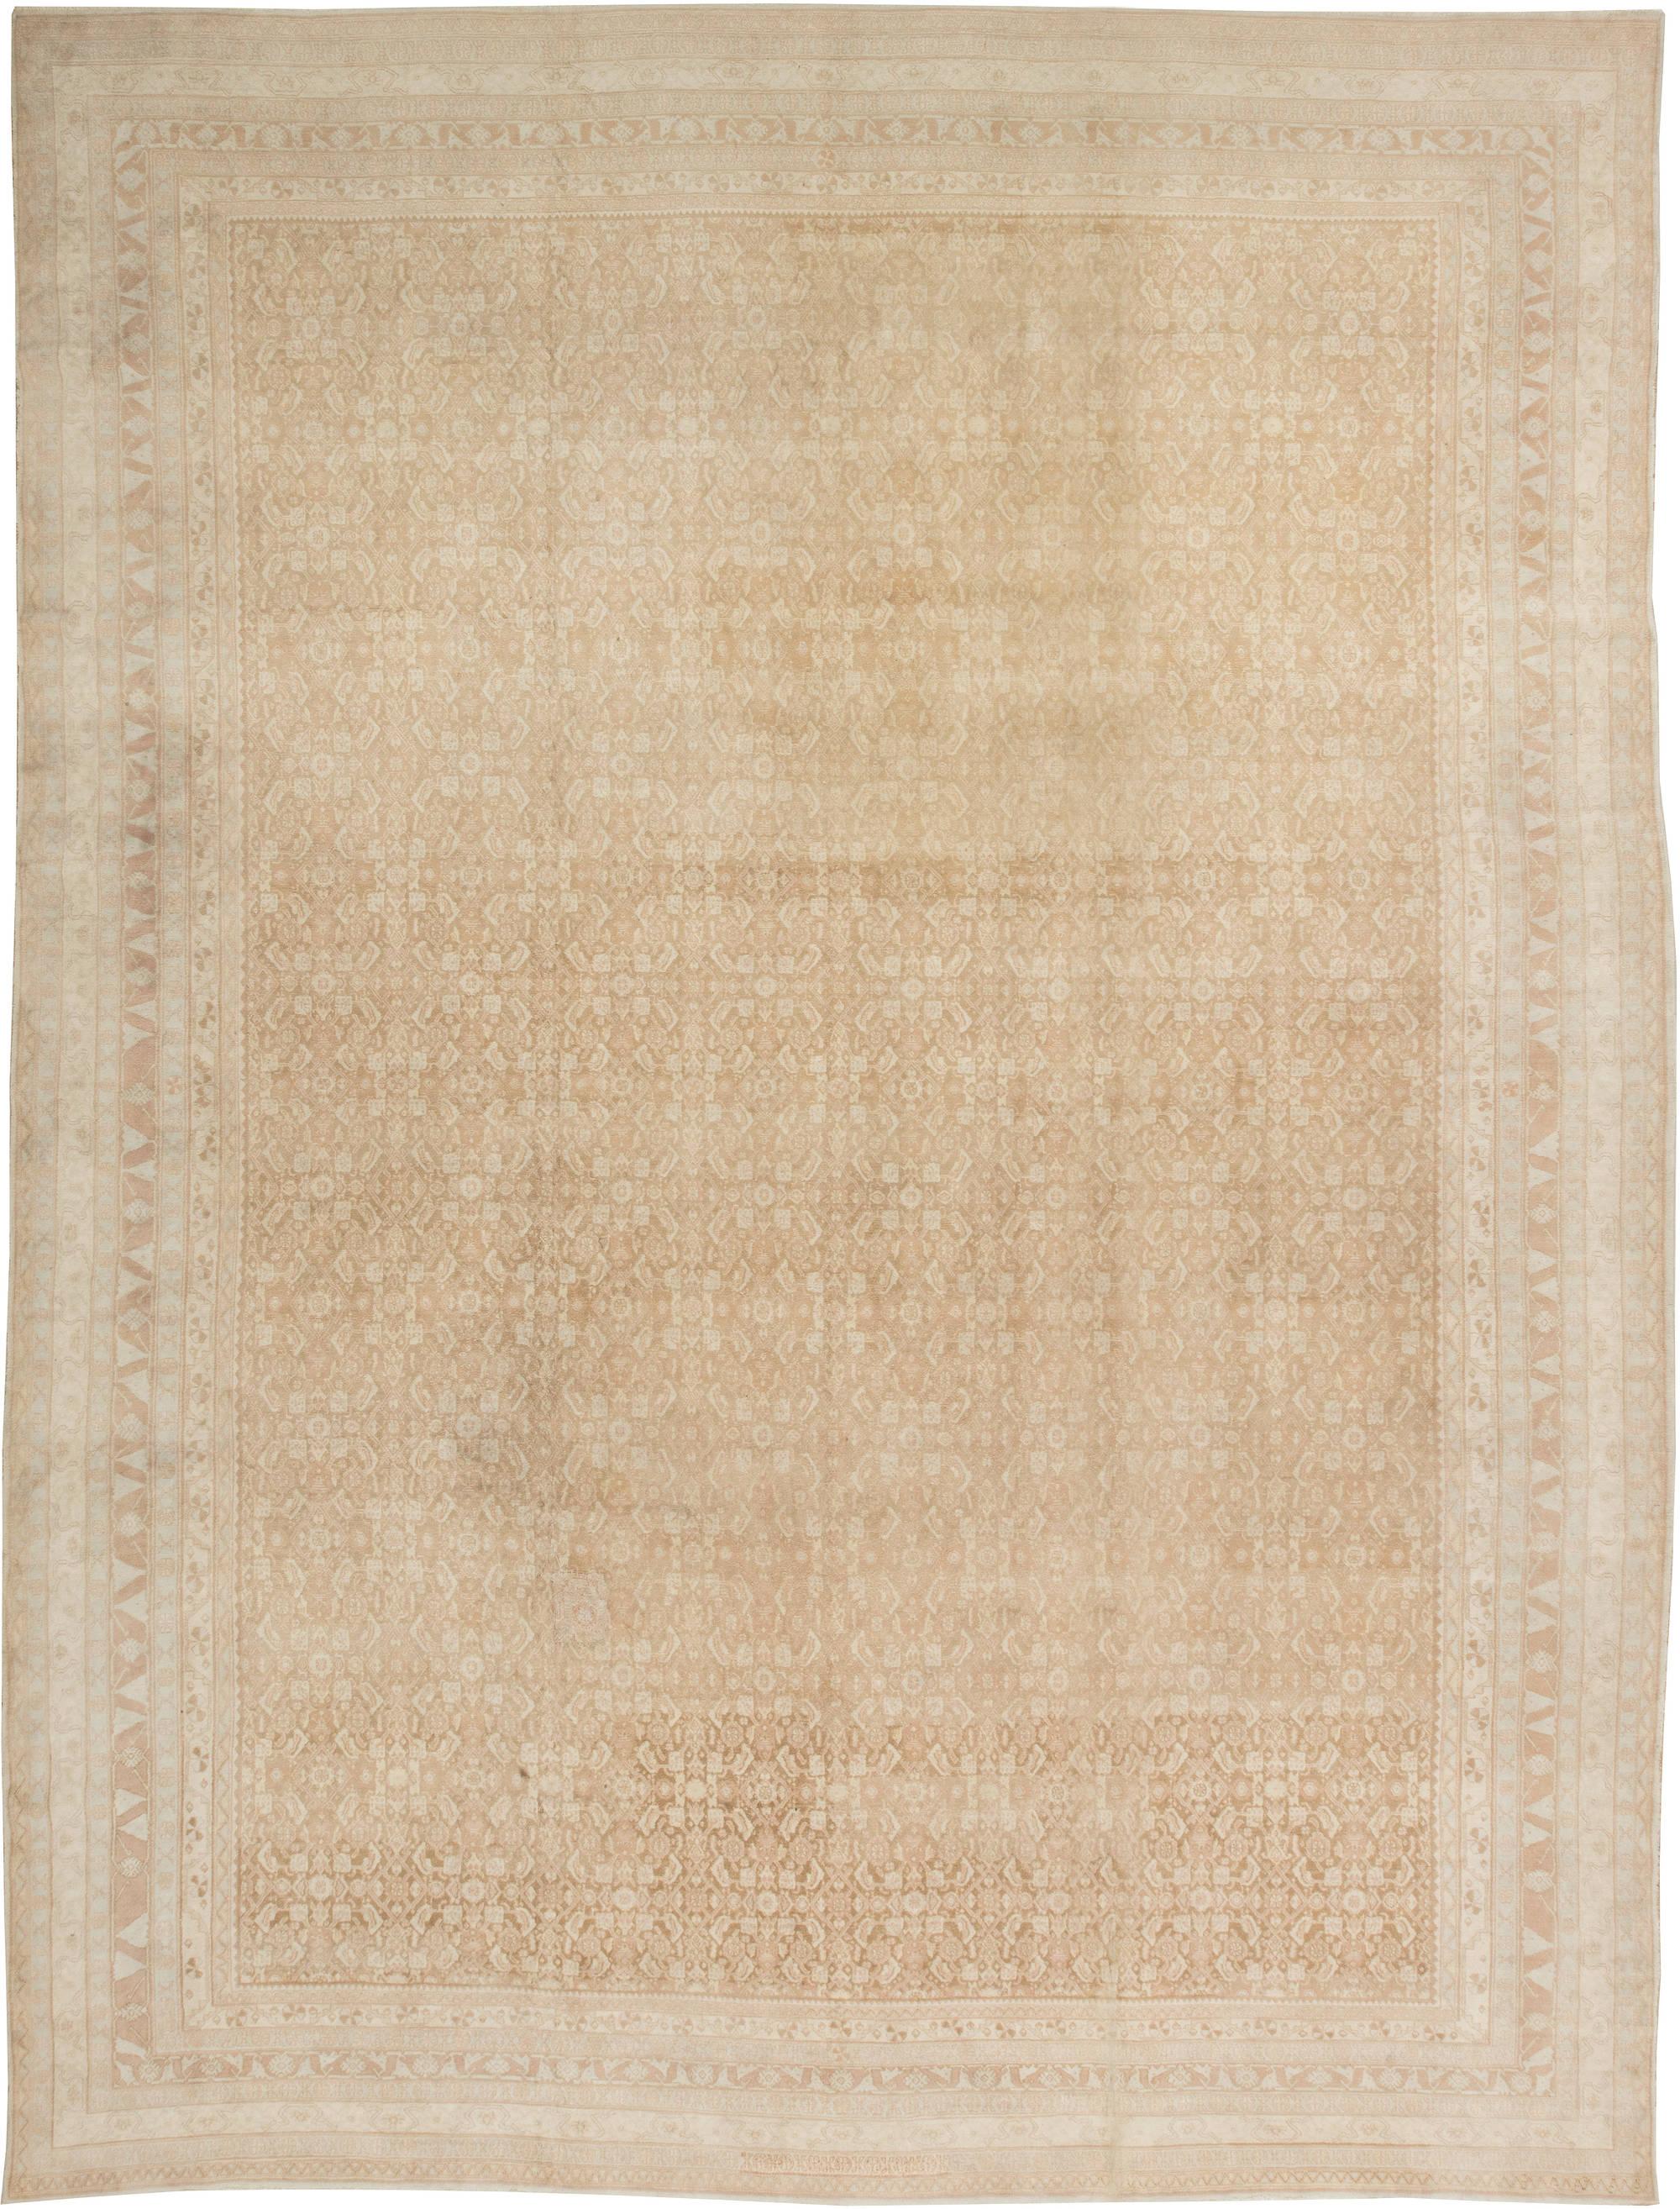 Antique Indian Agra Rug BB2676